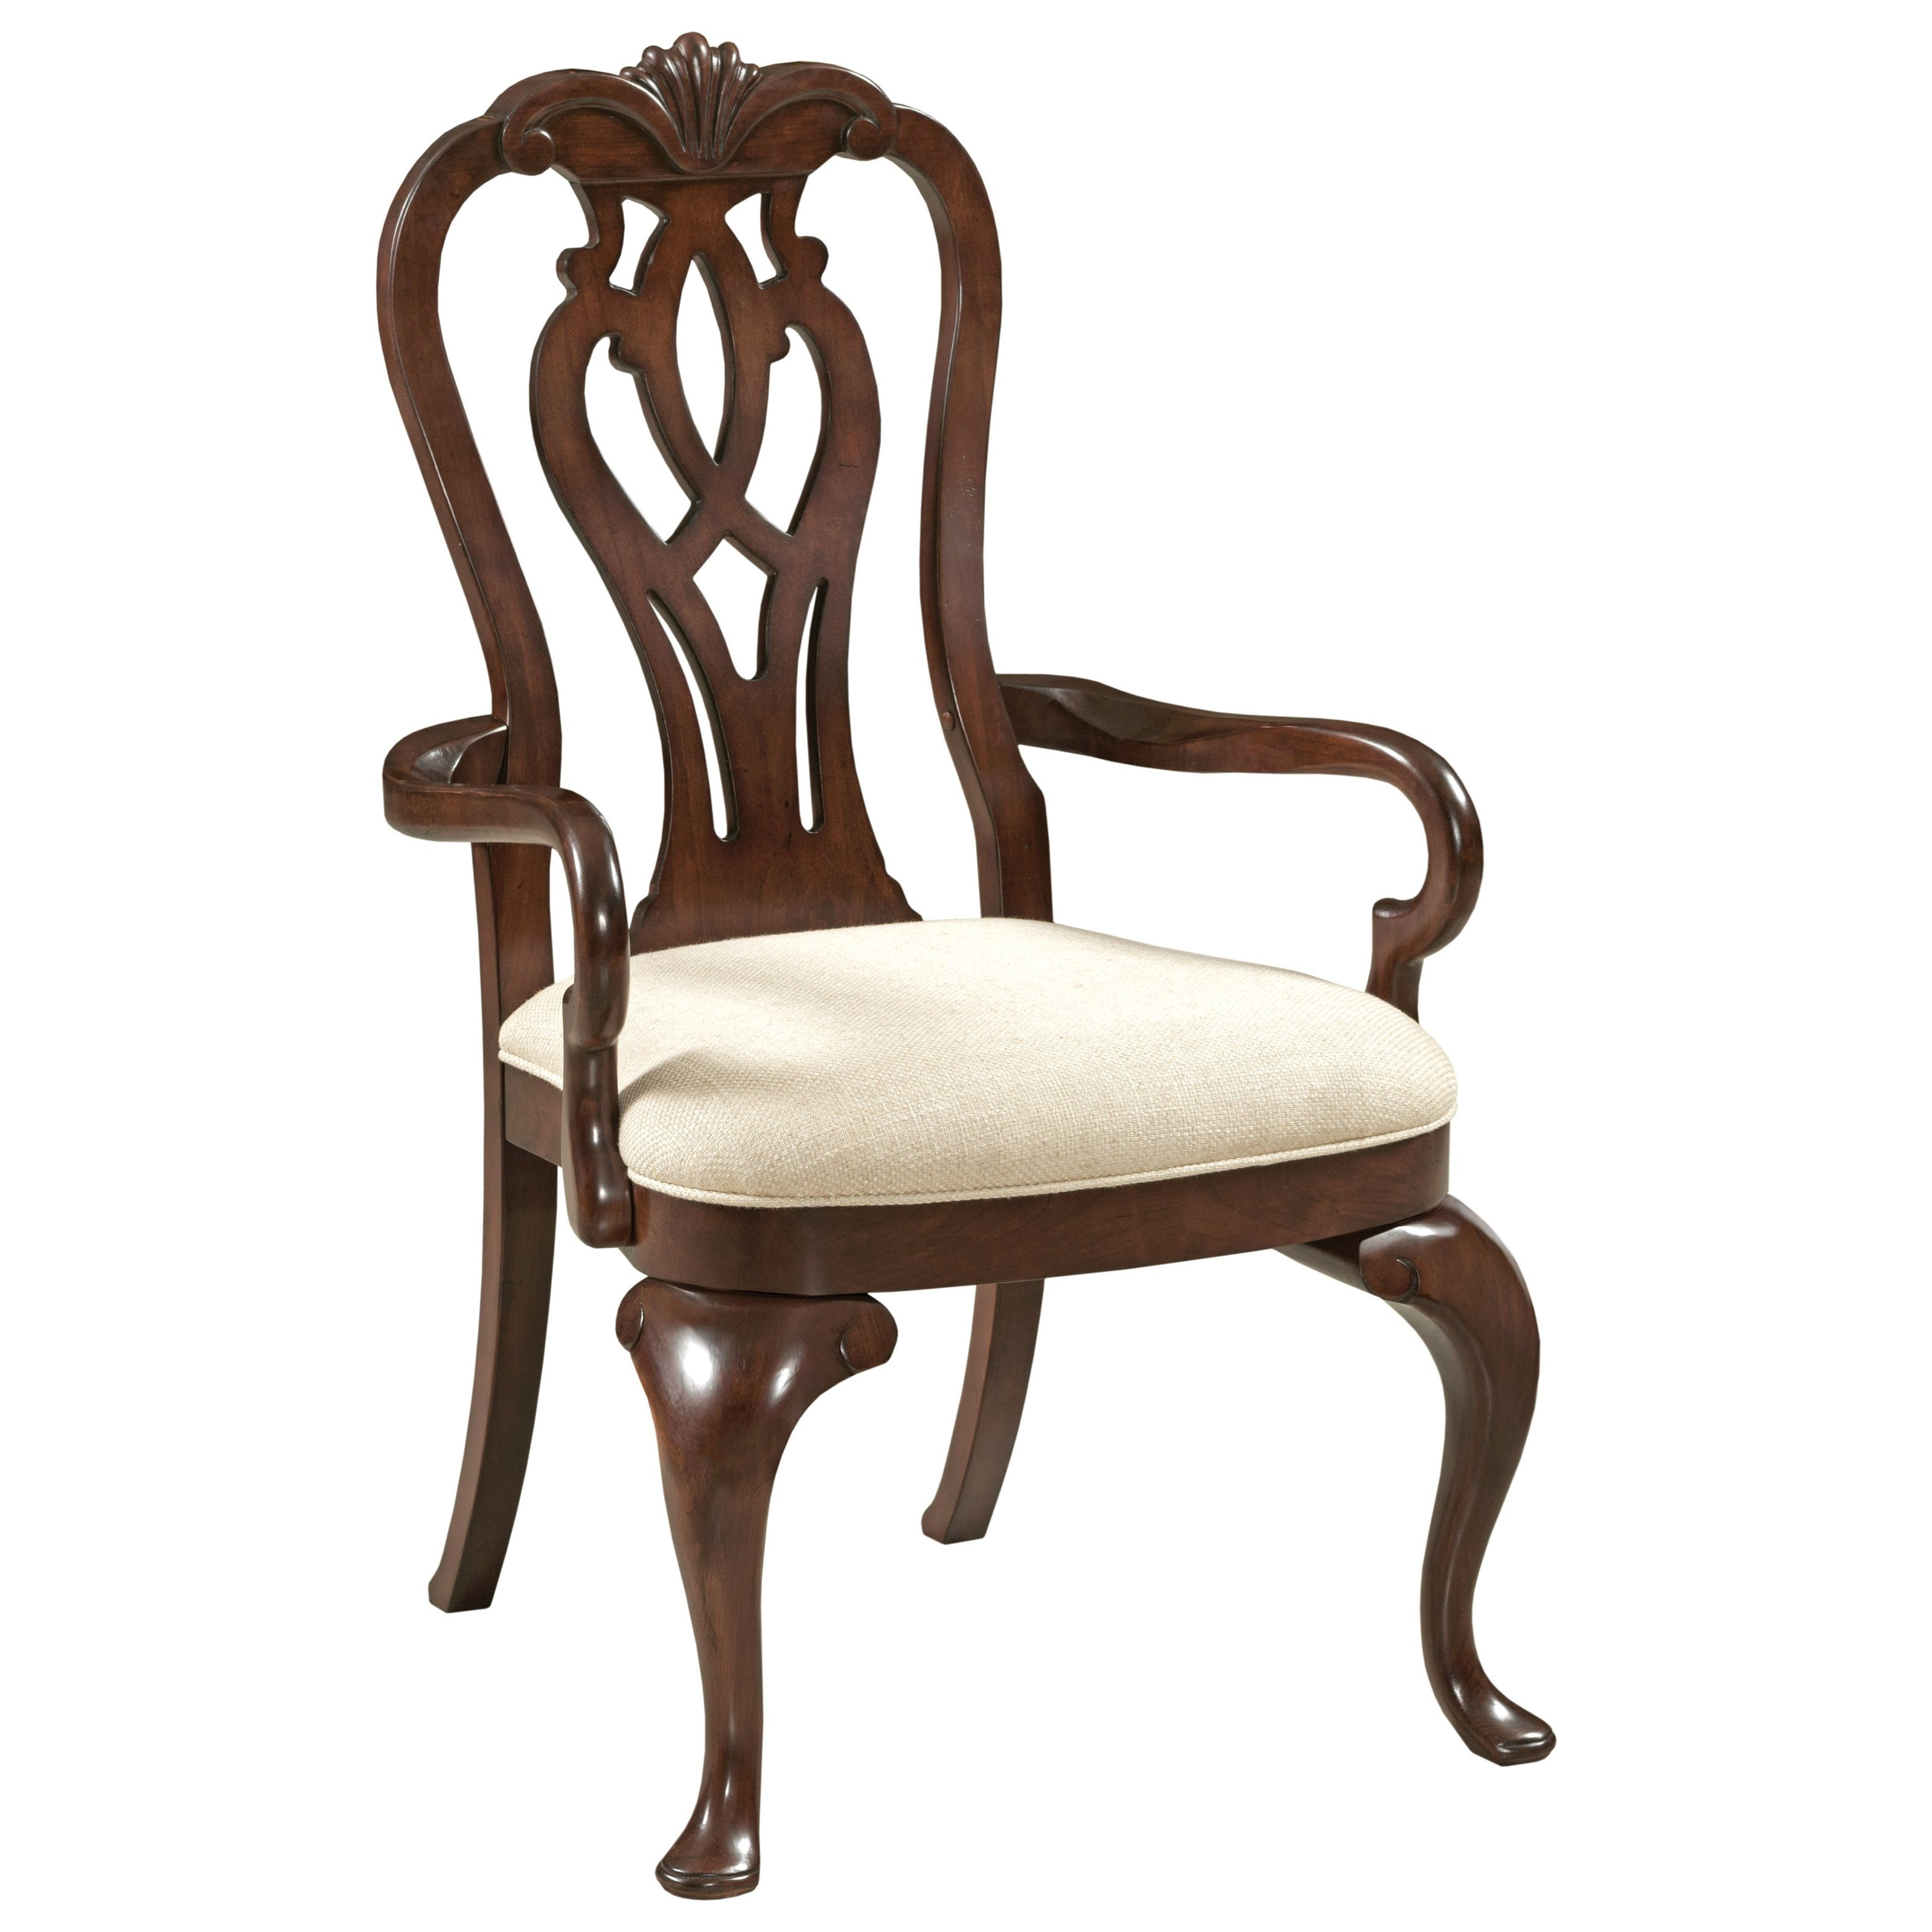 Queen Anne Dining Room Chairs: Kincaid Furniture Hadleigh Traditional Queen Anne Arm